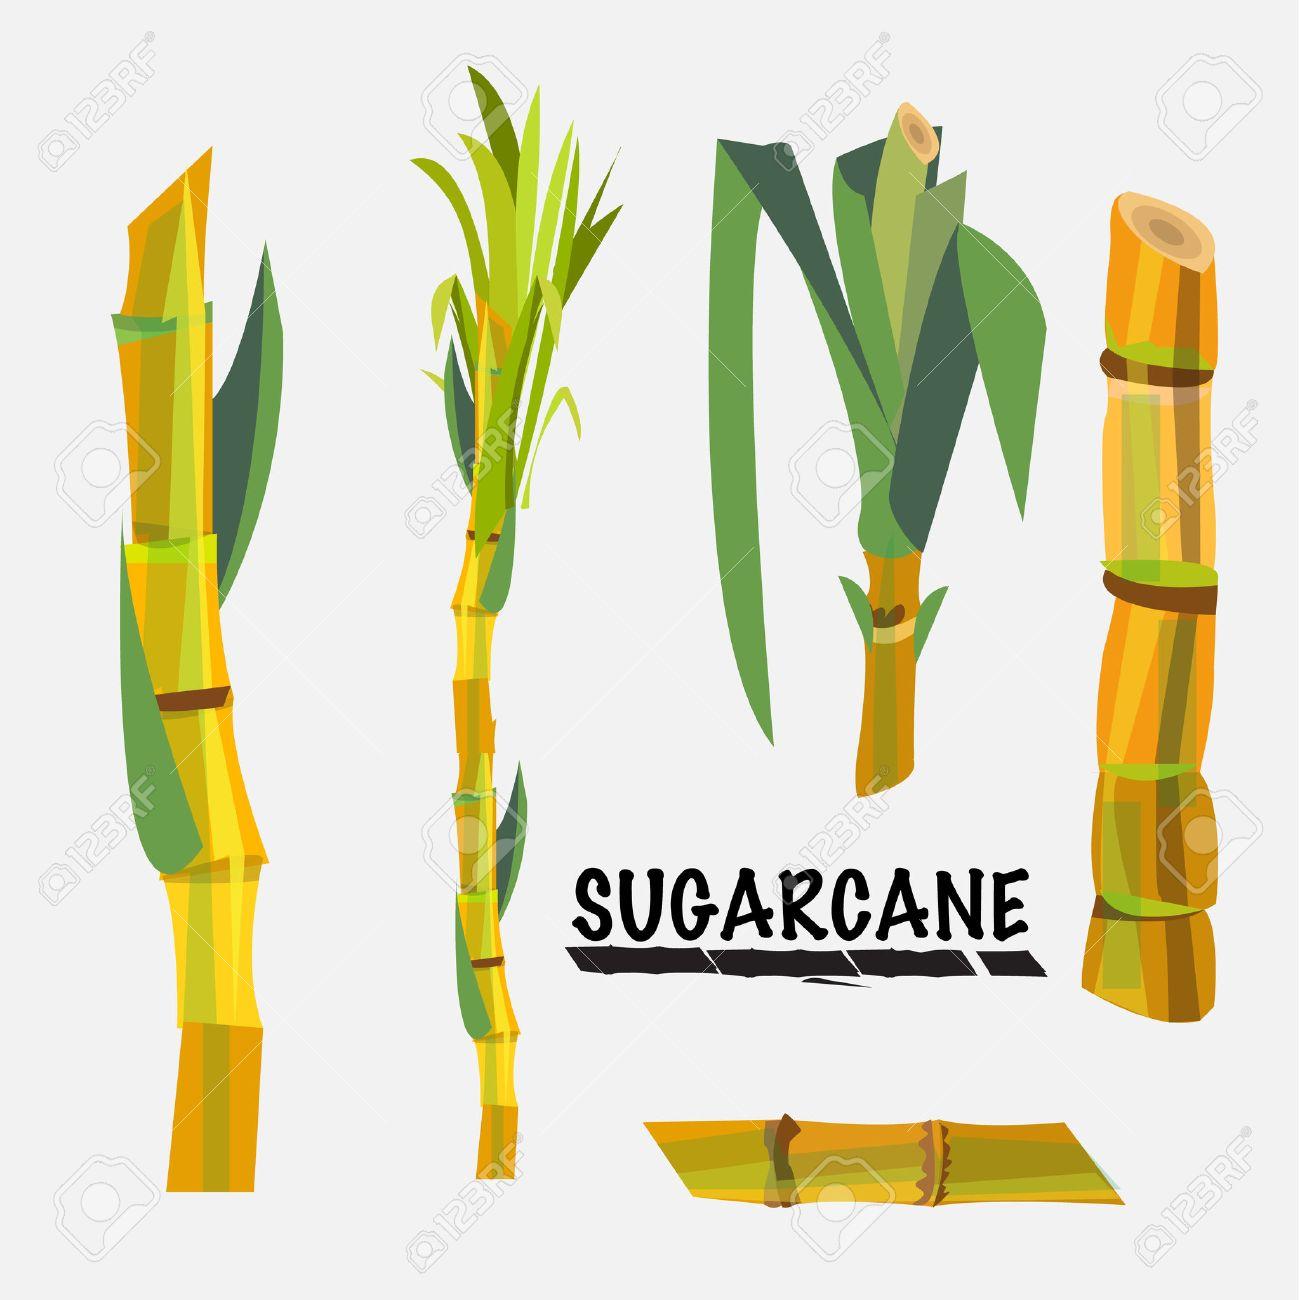 sugarcane - vector illustration - 45203426